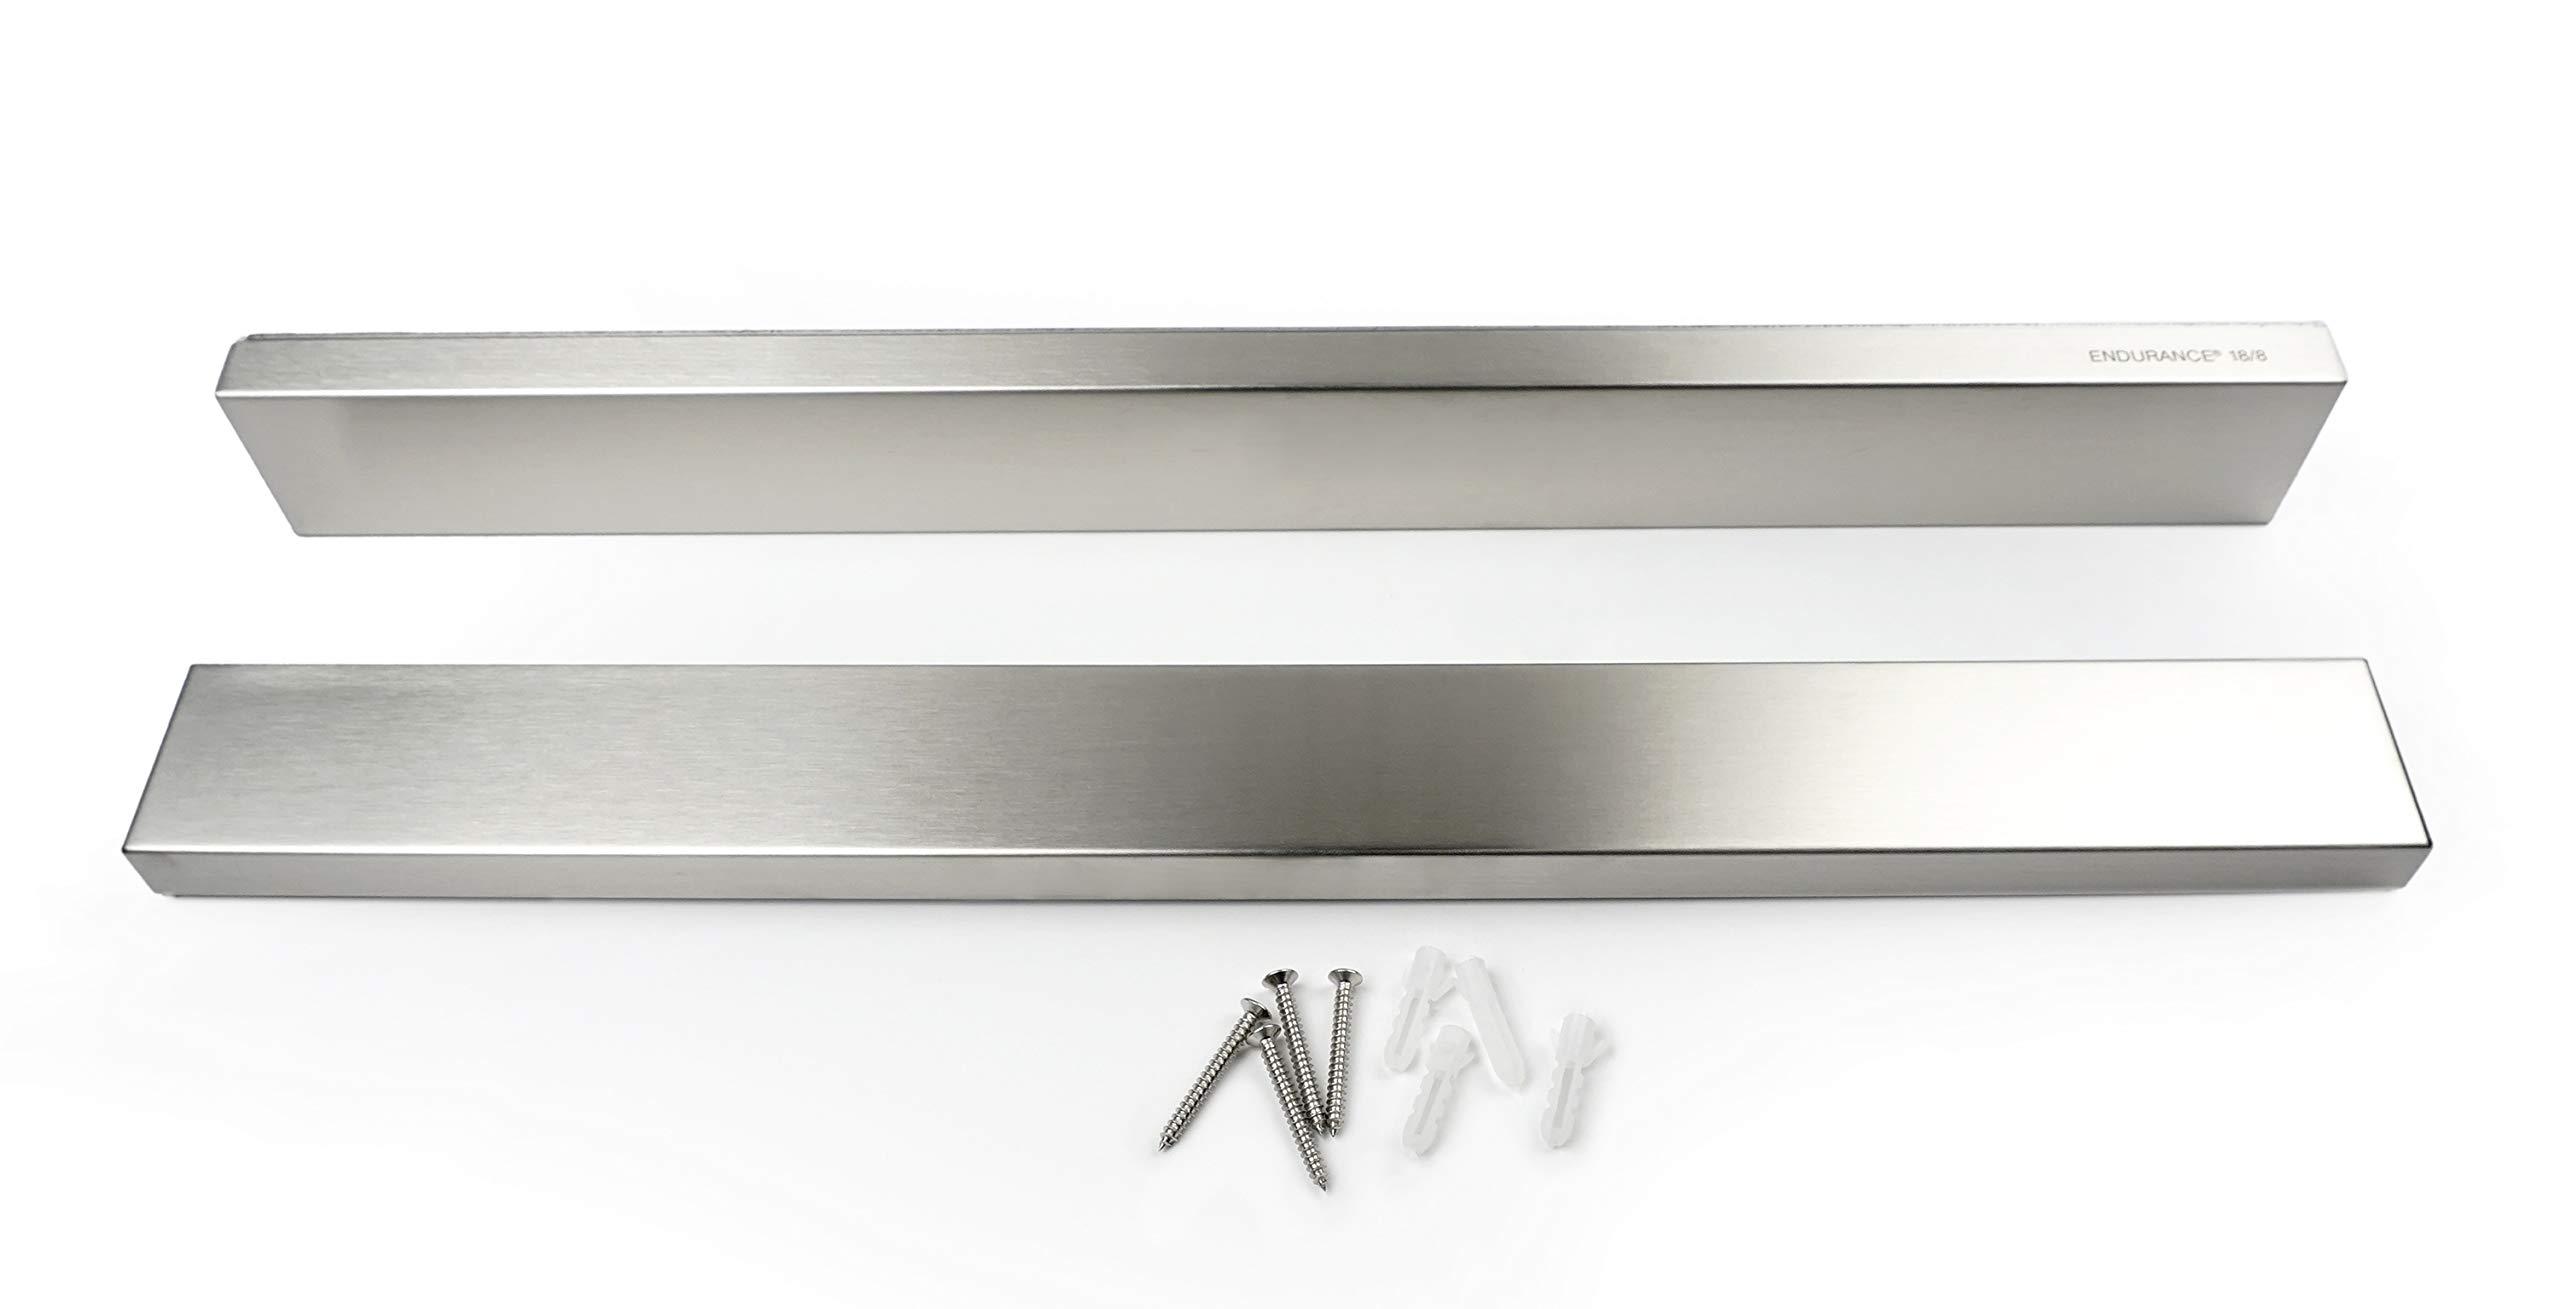 RSVP Endurance 18/8 Stainless Steel Deluxe Magnetic Knife Bars, Set of 2, 18-inch